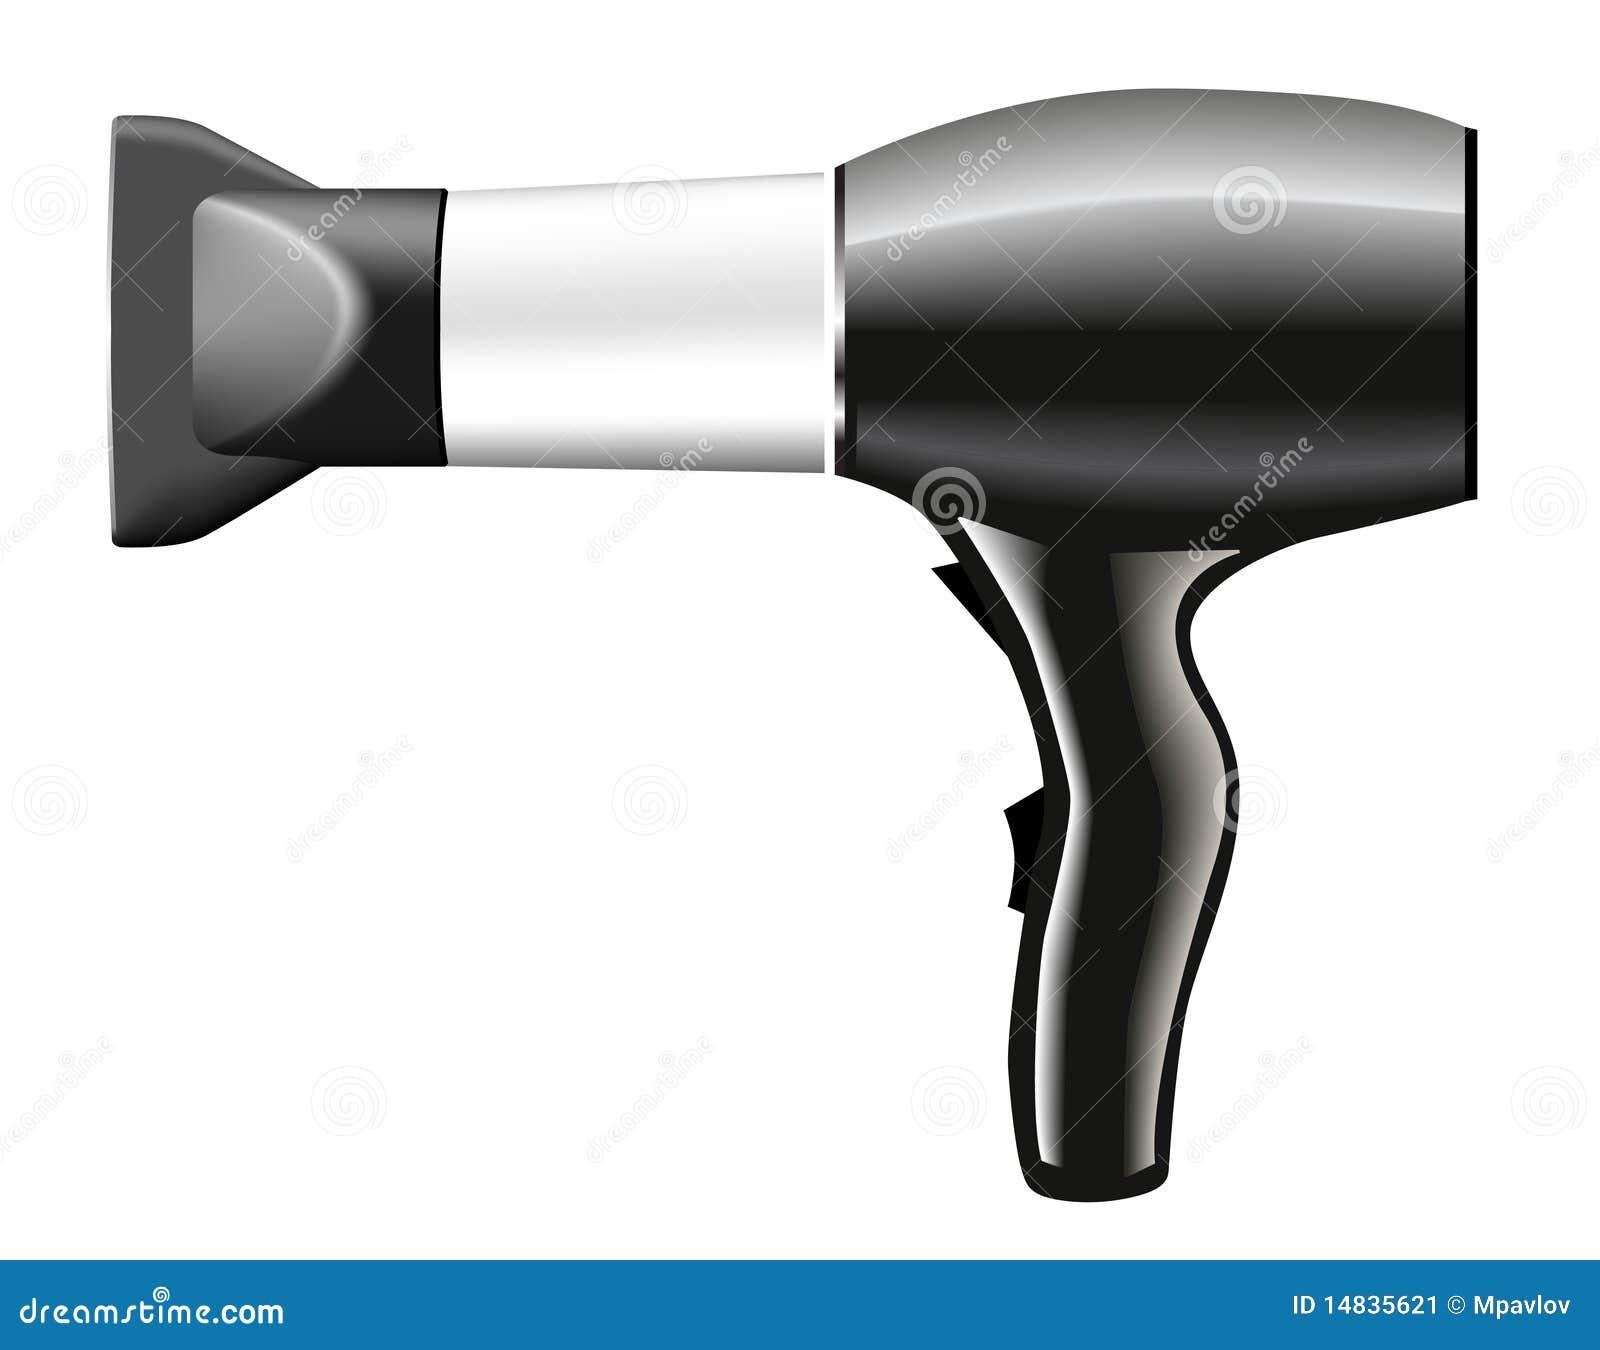 Animated Hair Dryer ~ Hair dryer grey illustration stock image